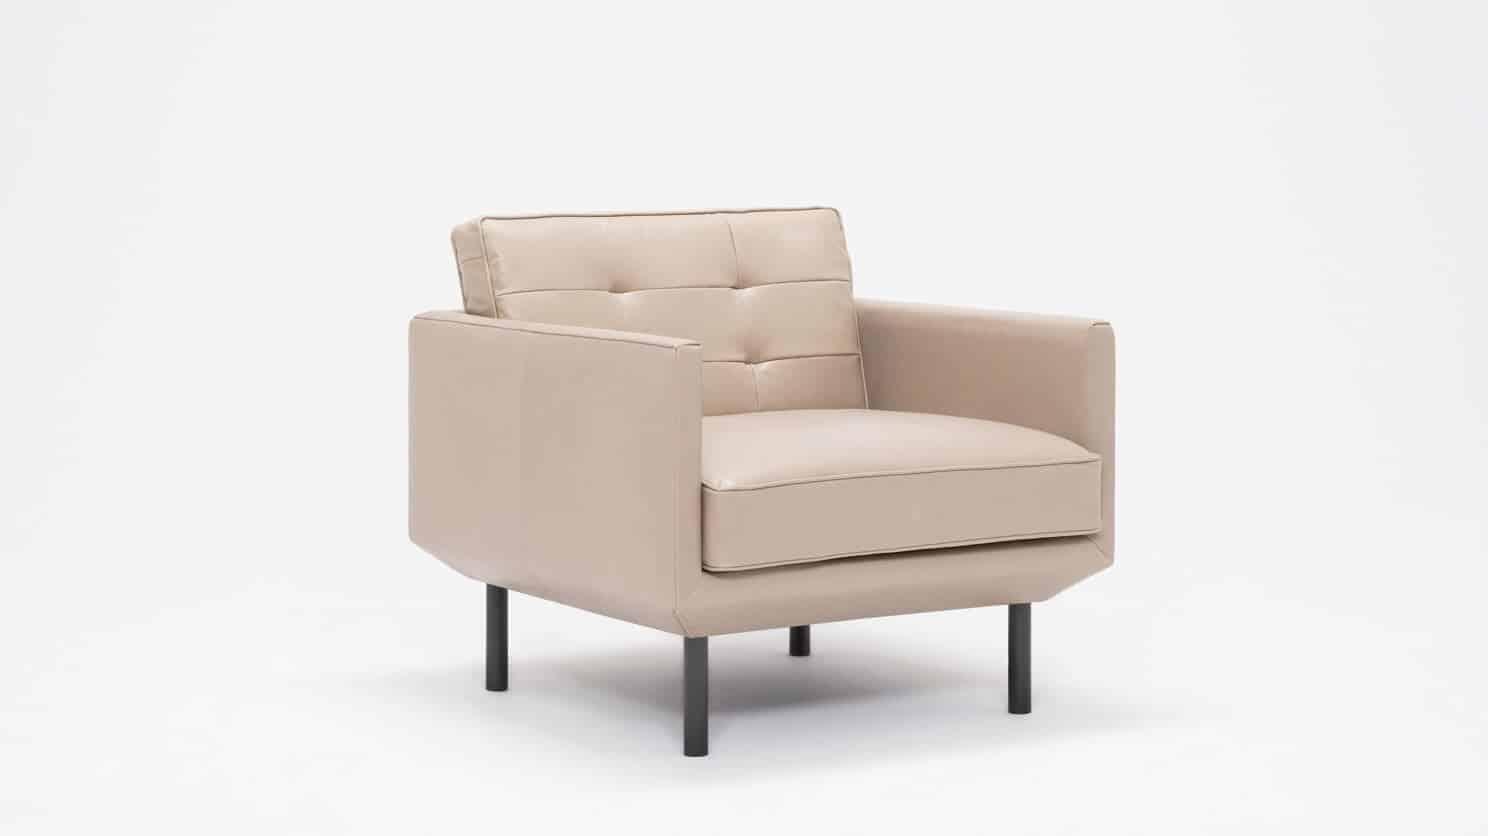 37155 95 par bp 2 chairs plateau club chair foam coachella warm grey corner 01